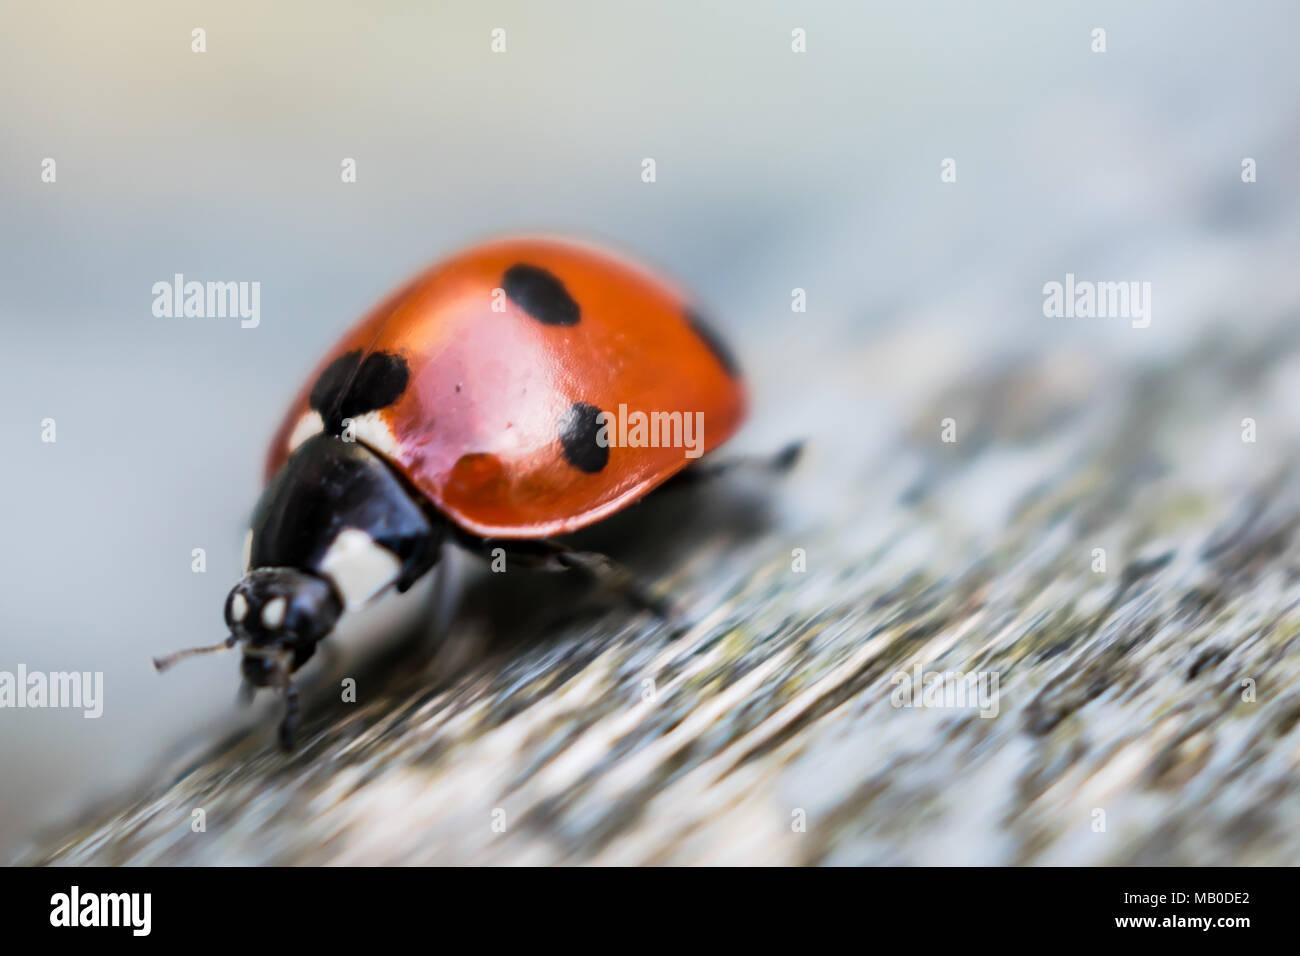 ladybird - Stock Image